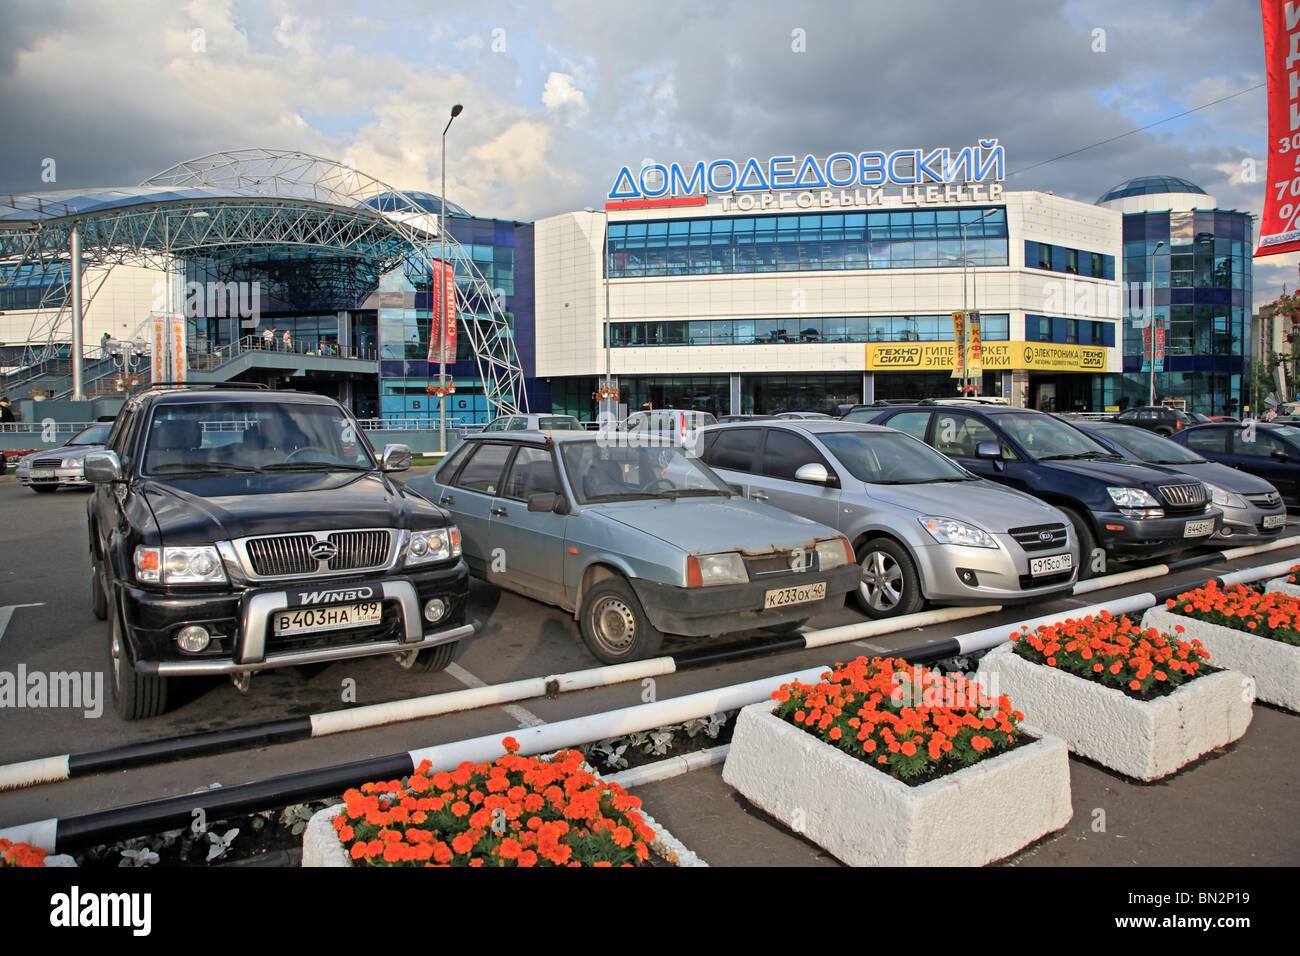 Trade center, Orekhovo-Borisovo Yuzhnoye district, Moscow, Russia - Stock Image